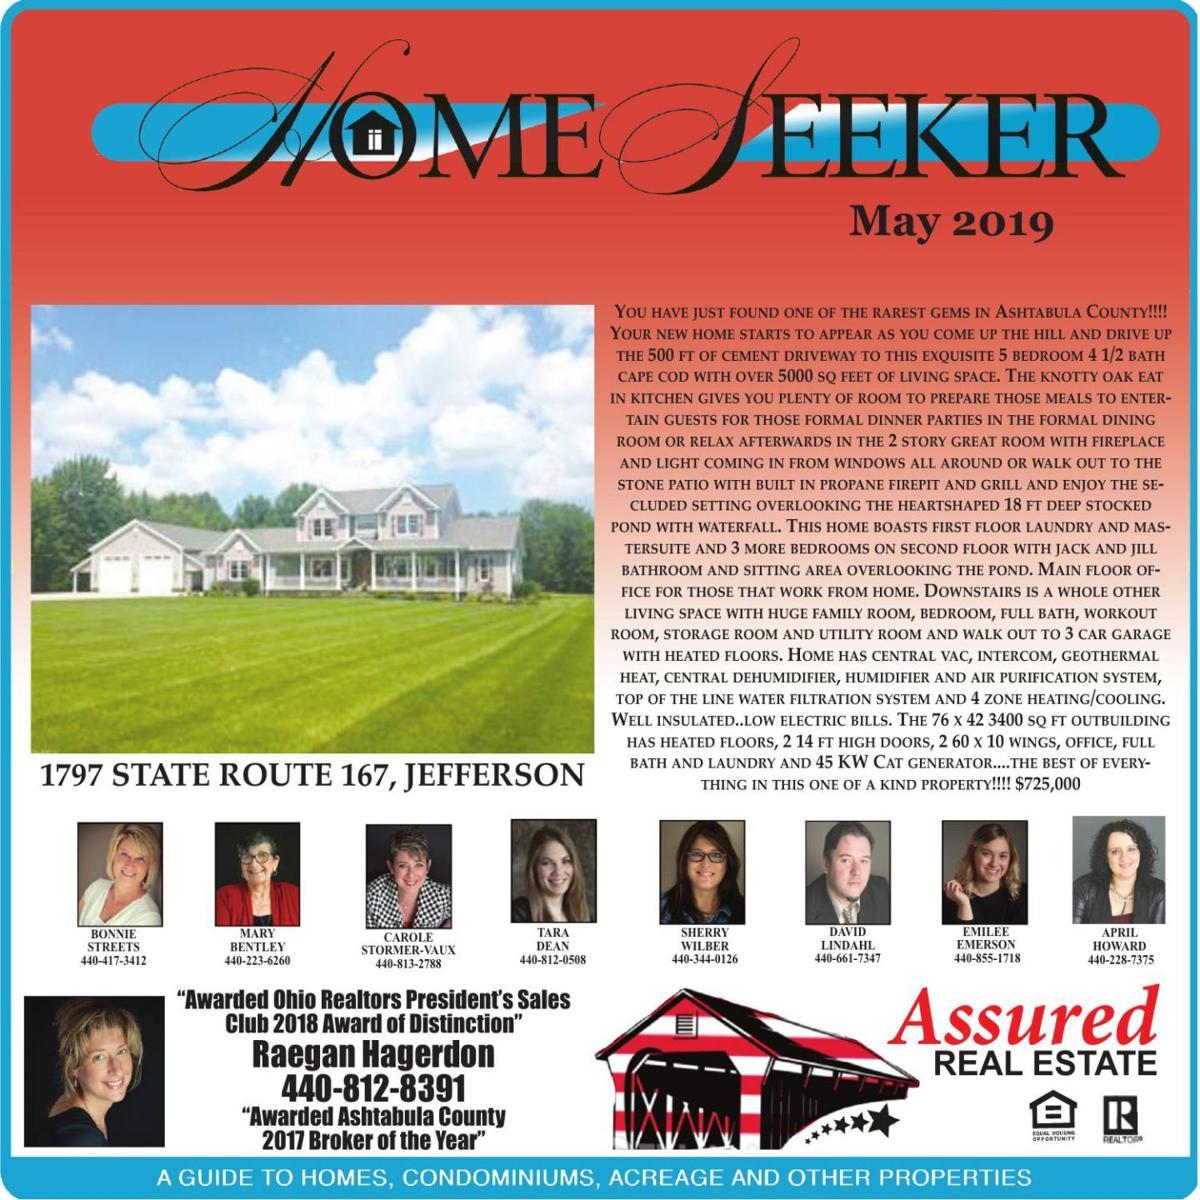 HOMESEEKER - MAY 2019